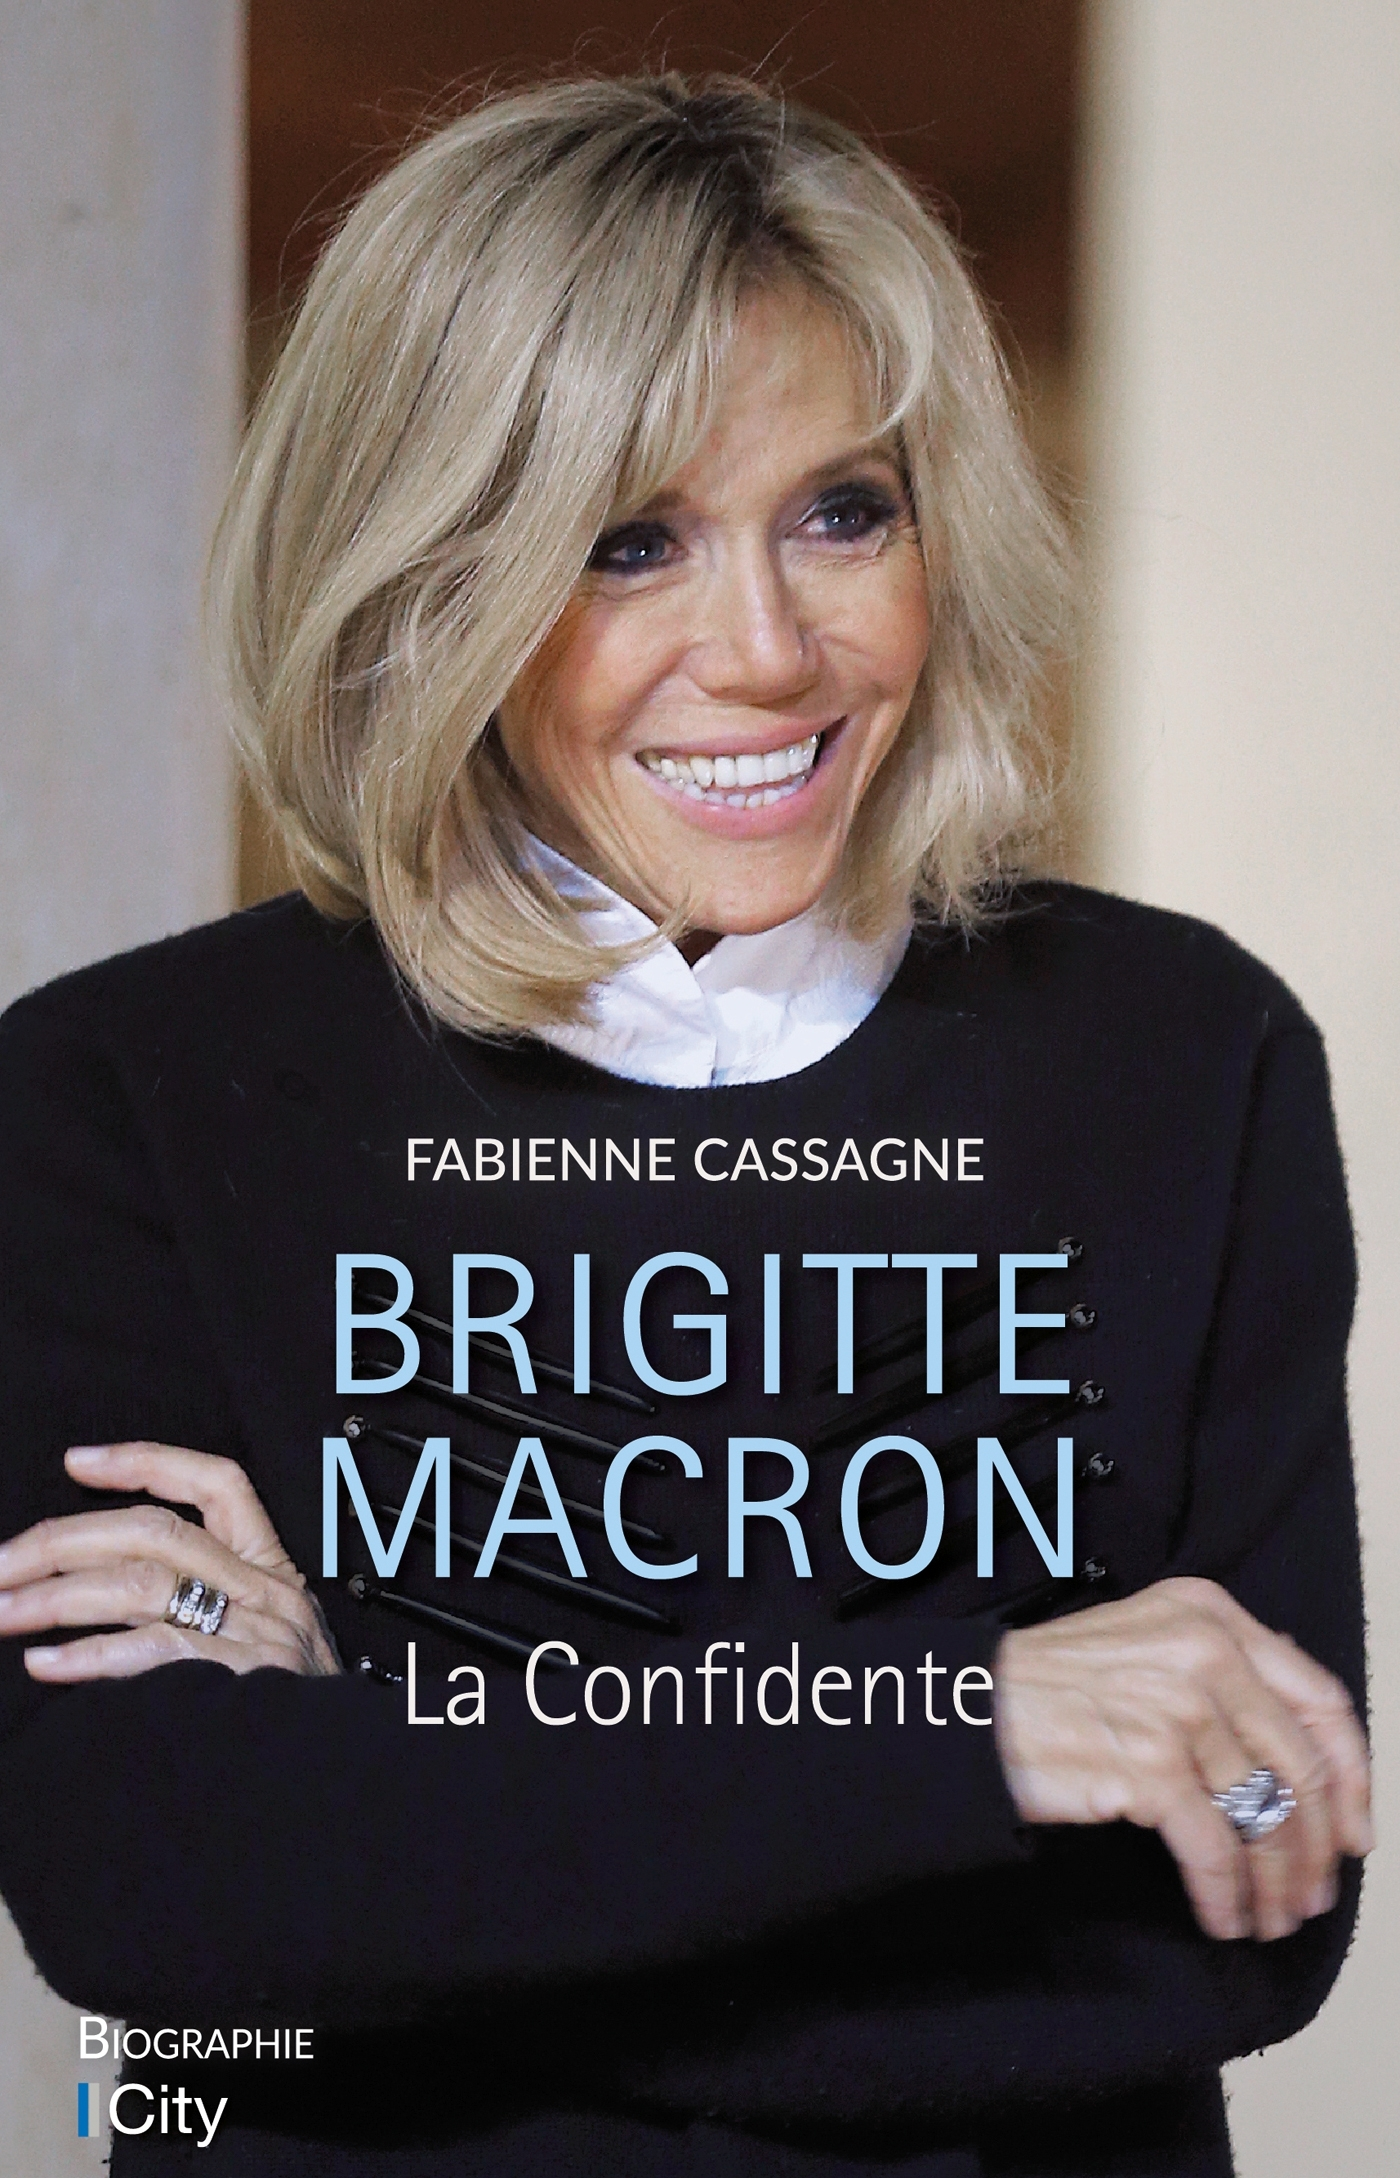 BRIGITTE MACRON, LA CONFIDENTE